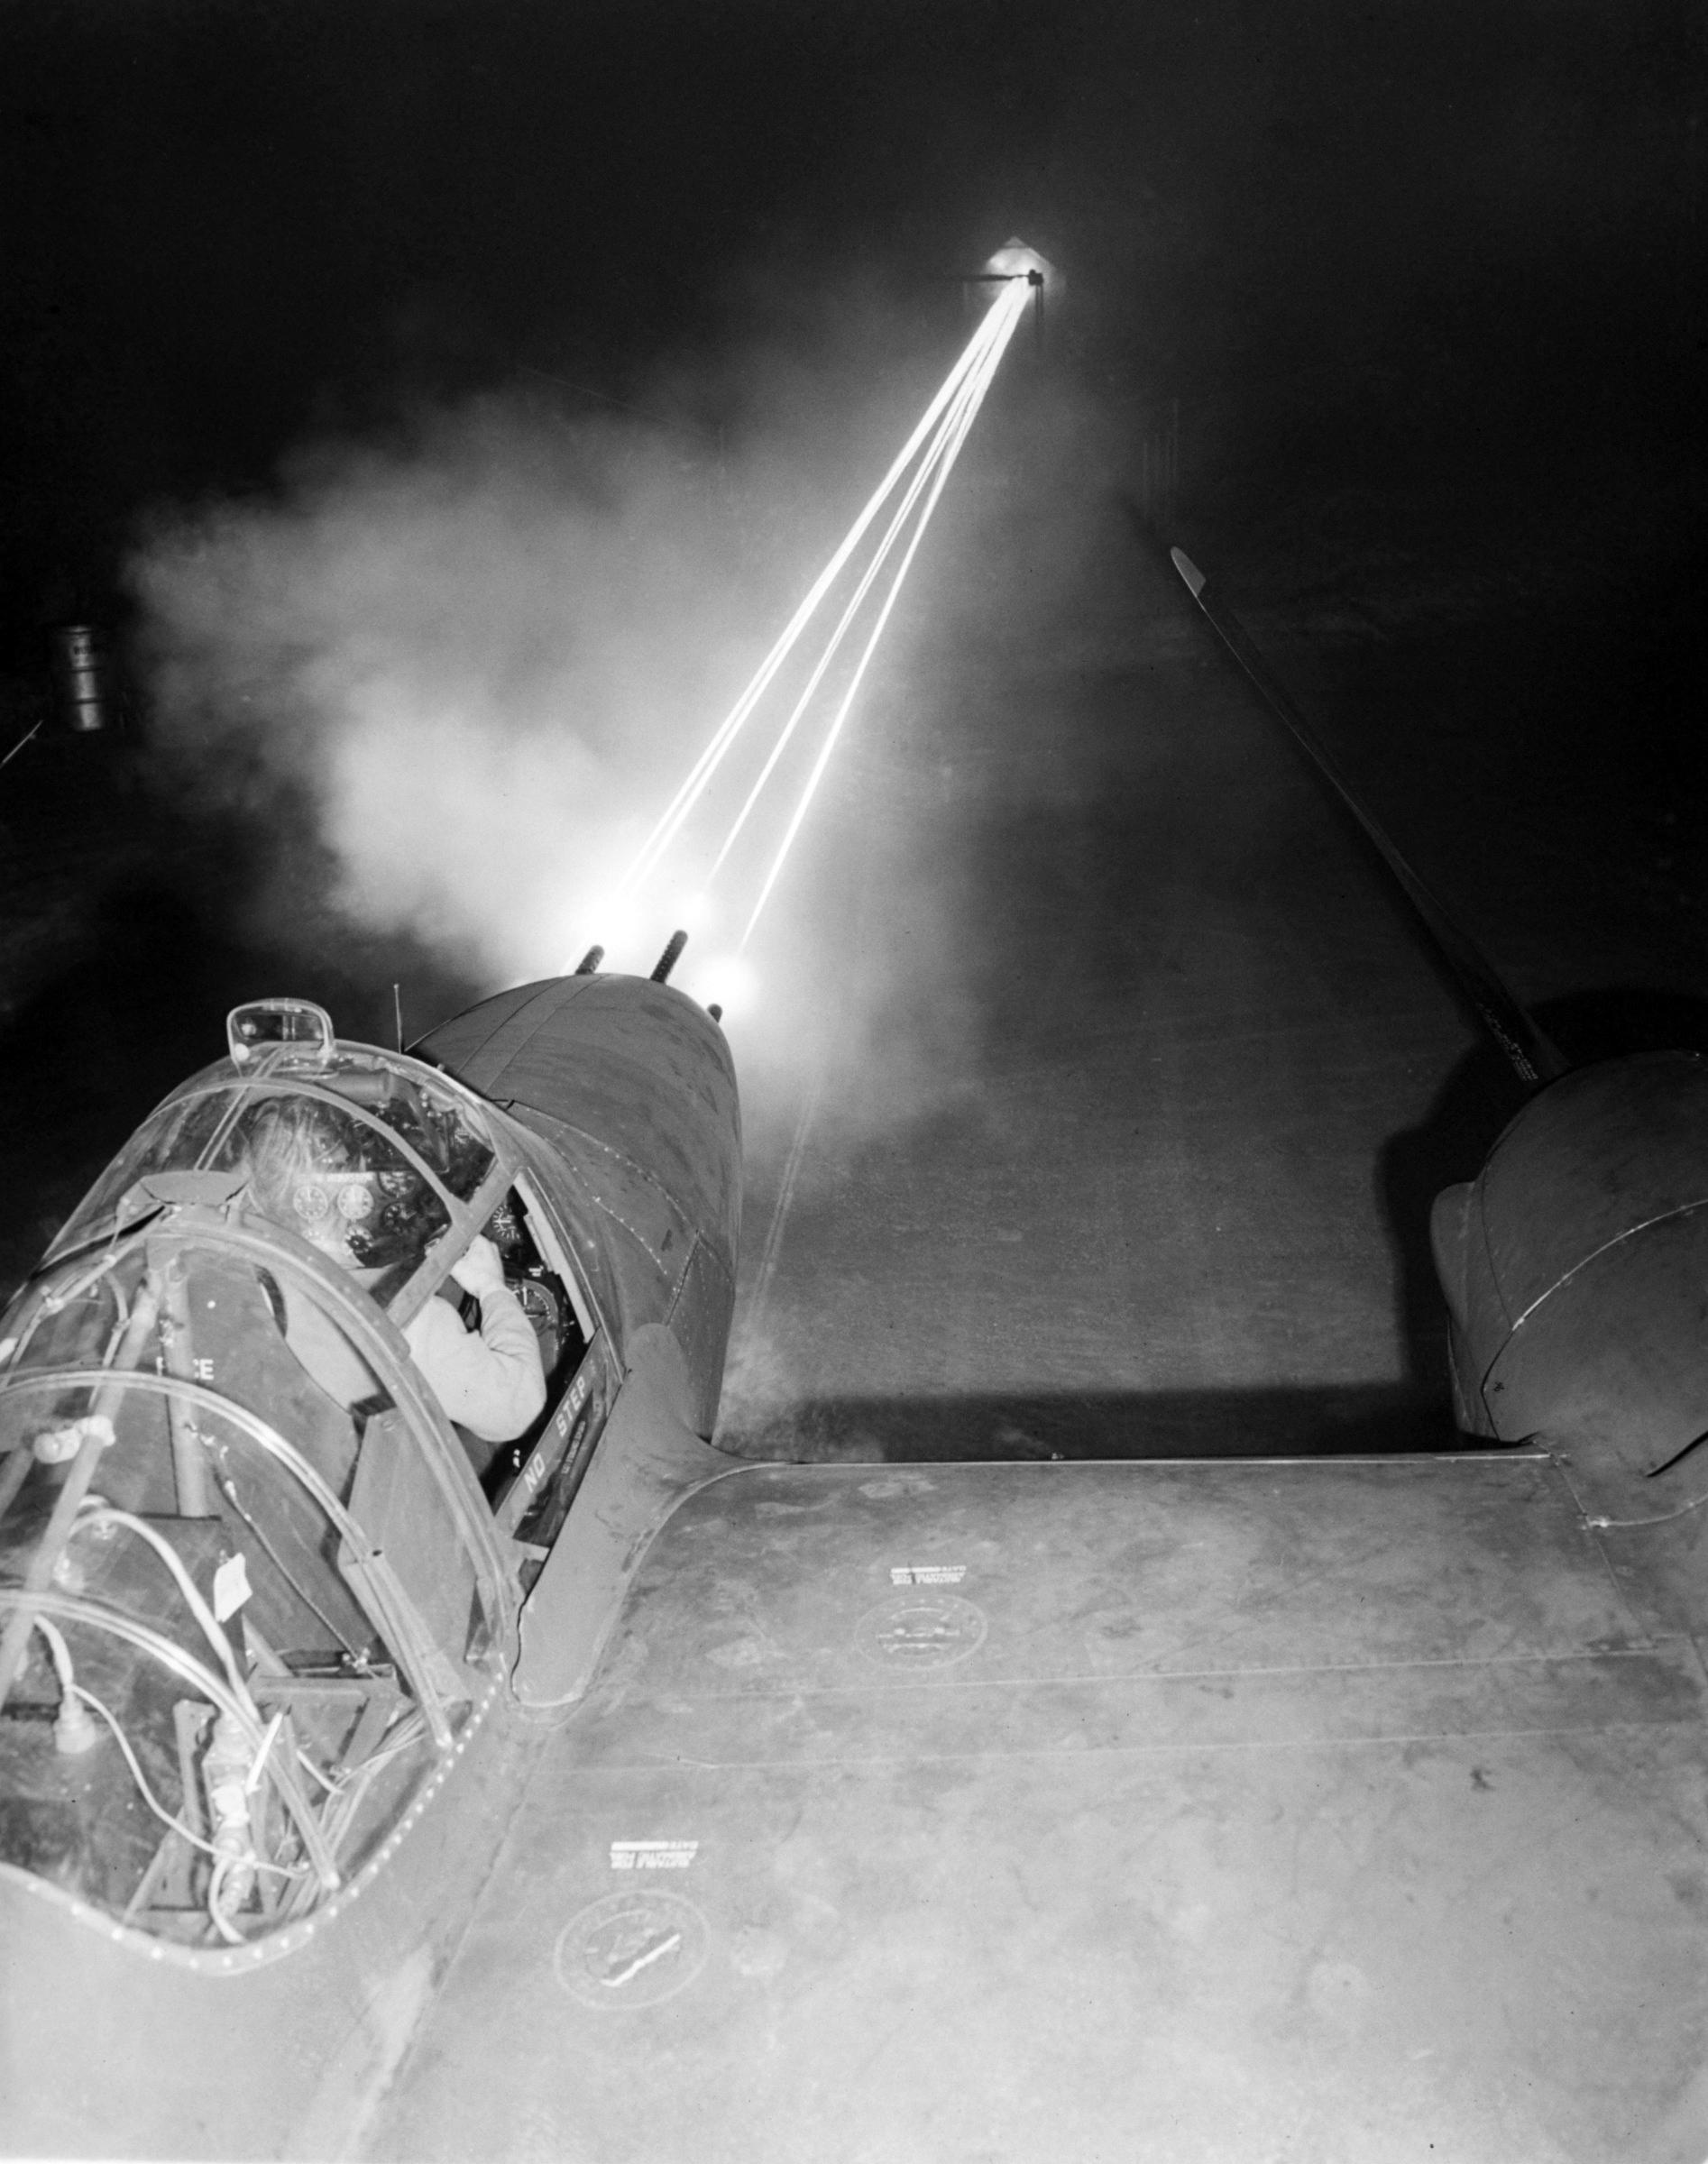 p-38-lightning-5